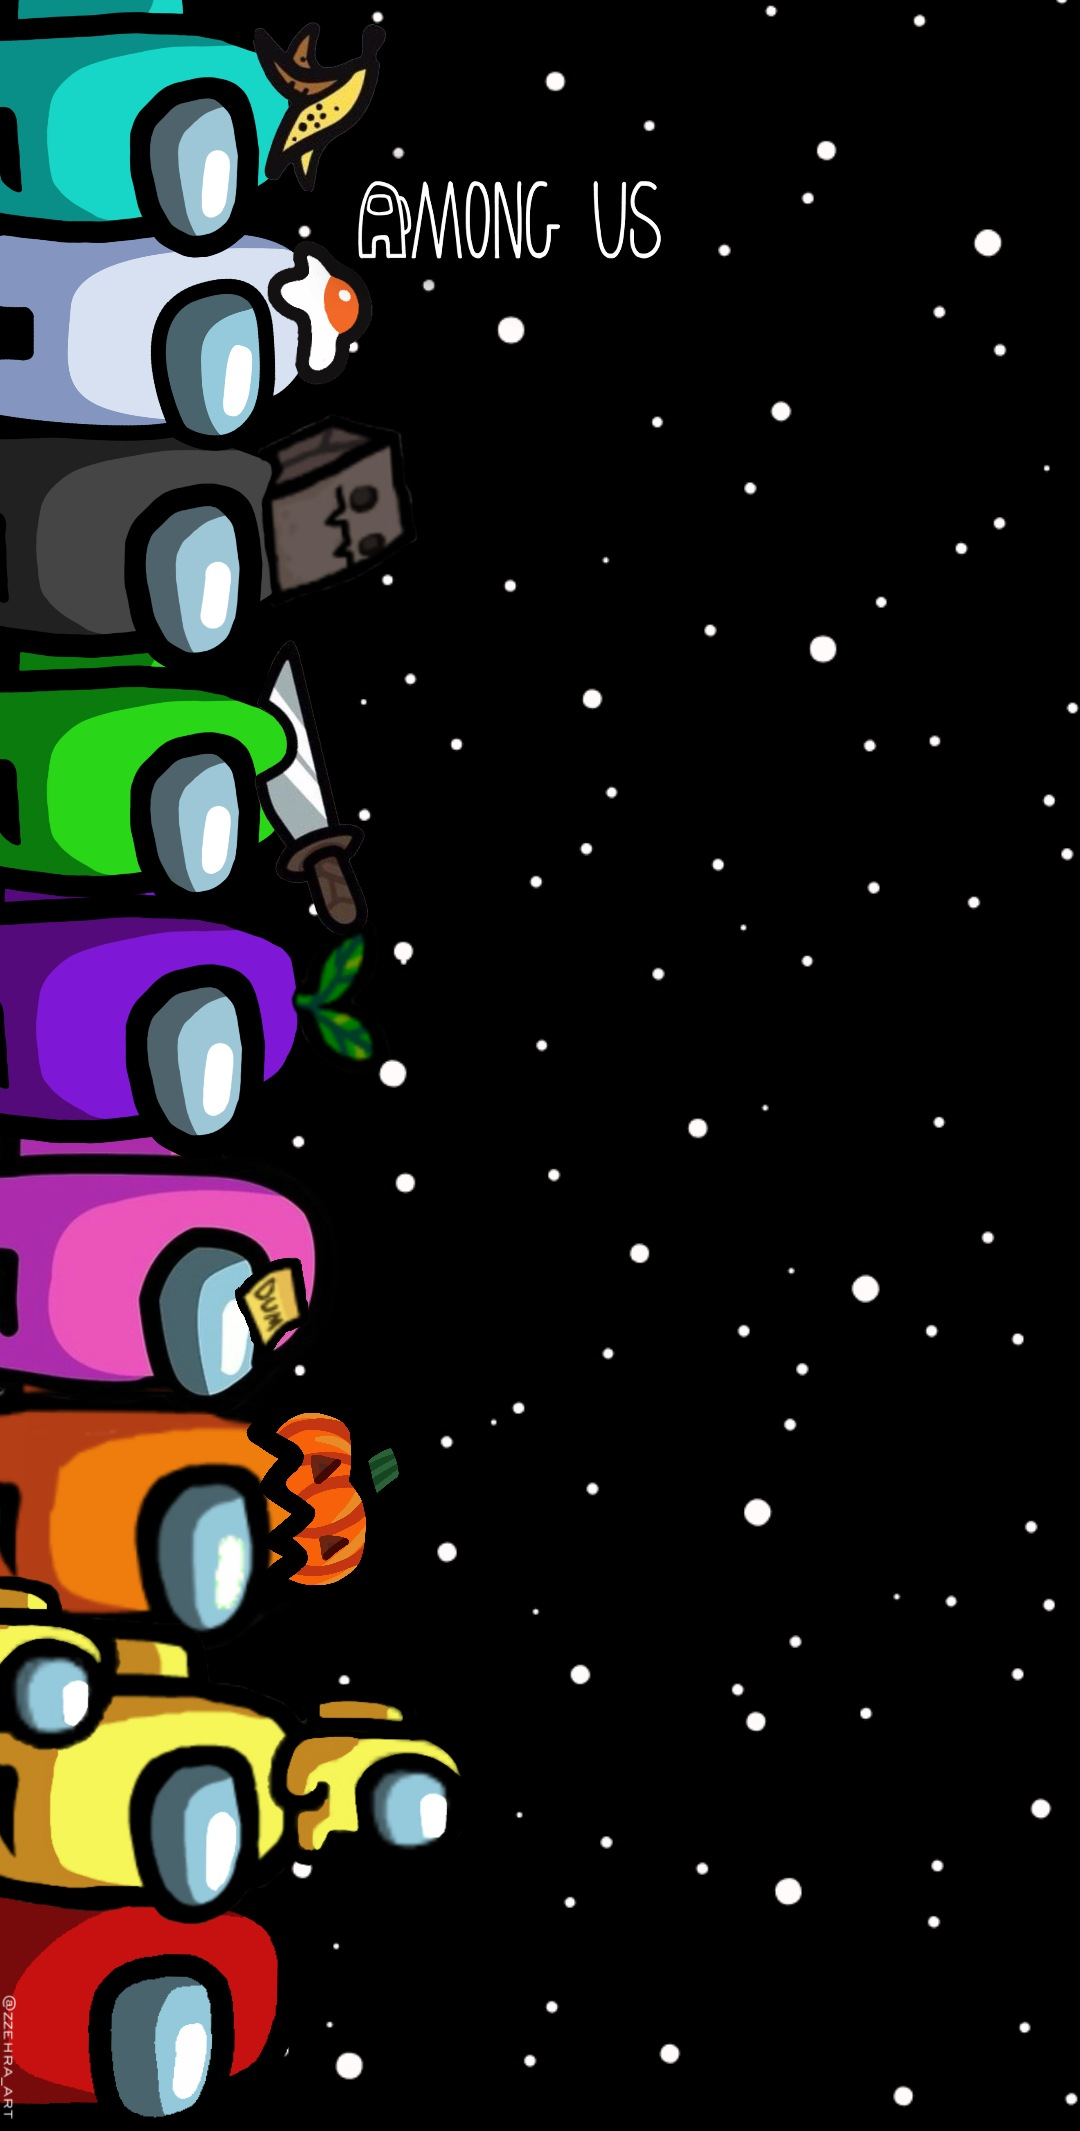 Amongus Game Wallpaper Black Image By Zehra